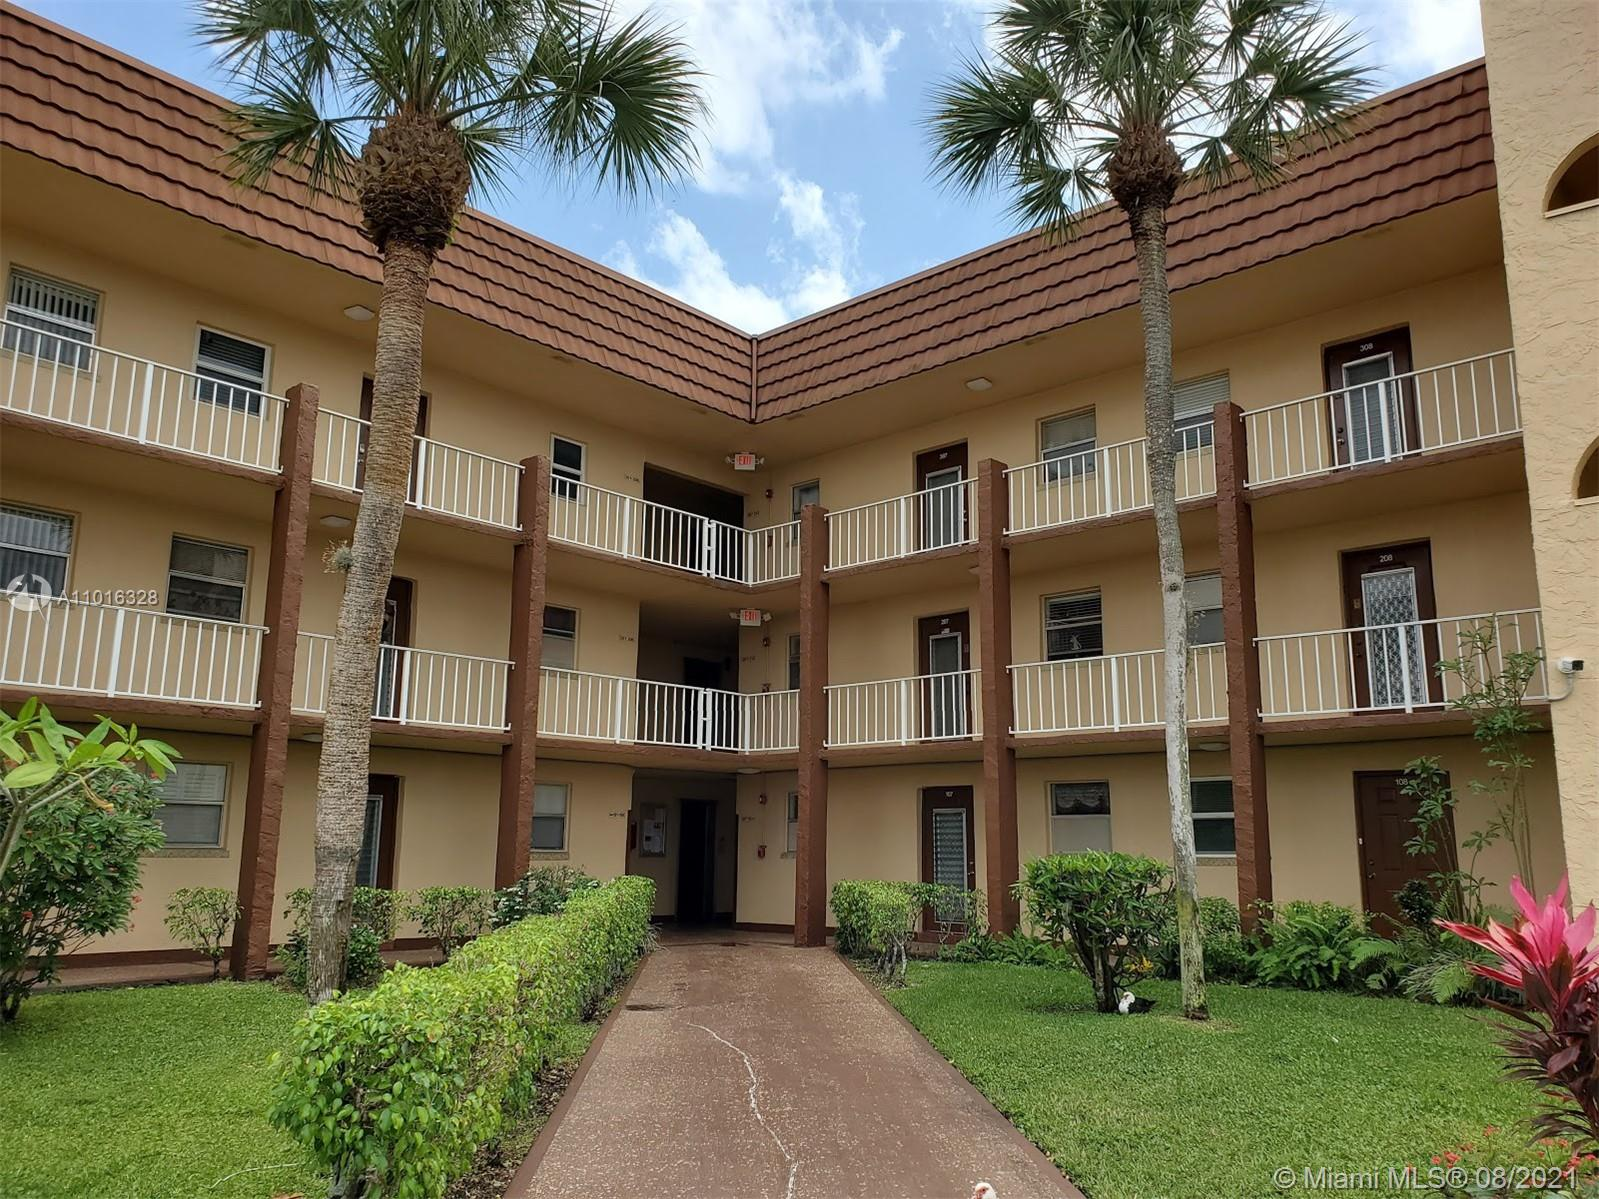 Property for sale at 2900 N Pine Island Rd Unit: 303, Sunrise,  Florida 33322